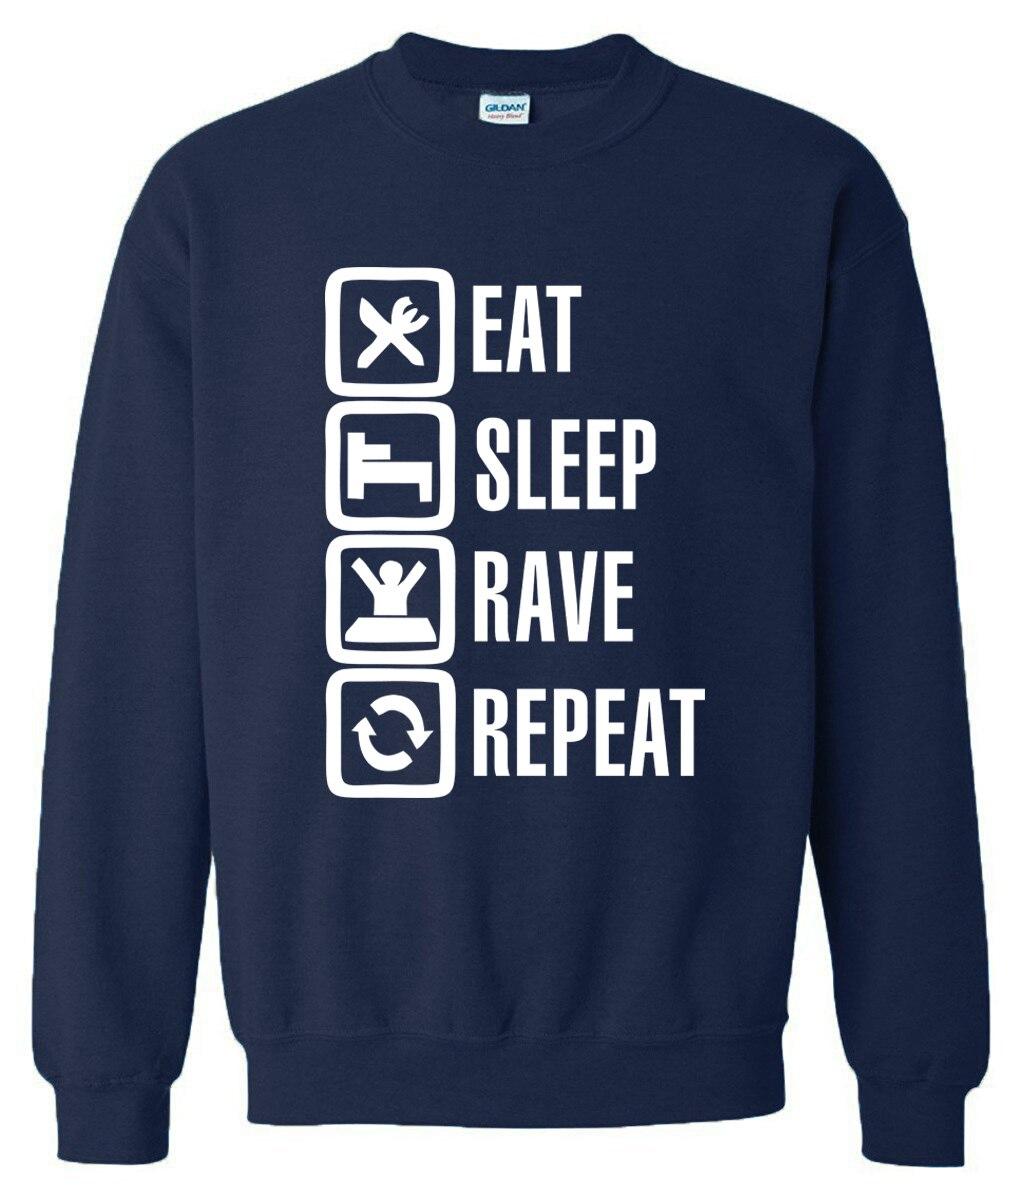 Men's Clothing Instruction Symbol Capless Sweatshirt Men Hip Hop Fashion Autumn Winter Hoodies Men Casual Eat Sleep Rave Repeat 2 Color Clothes